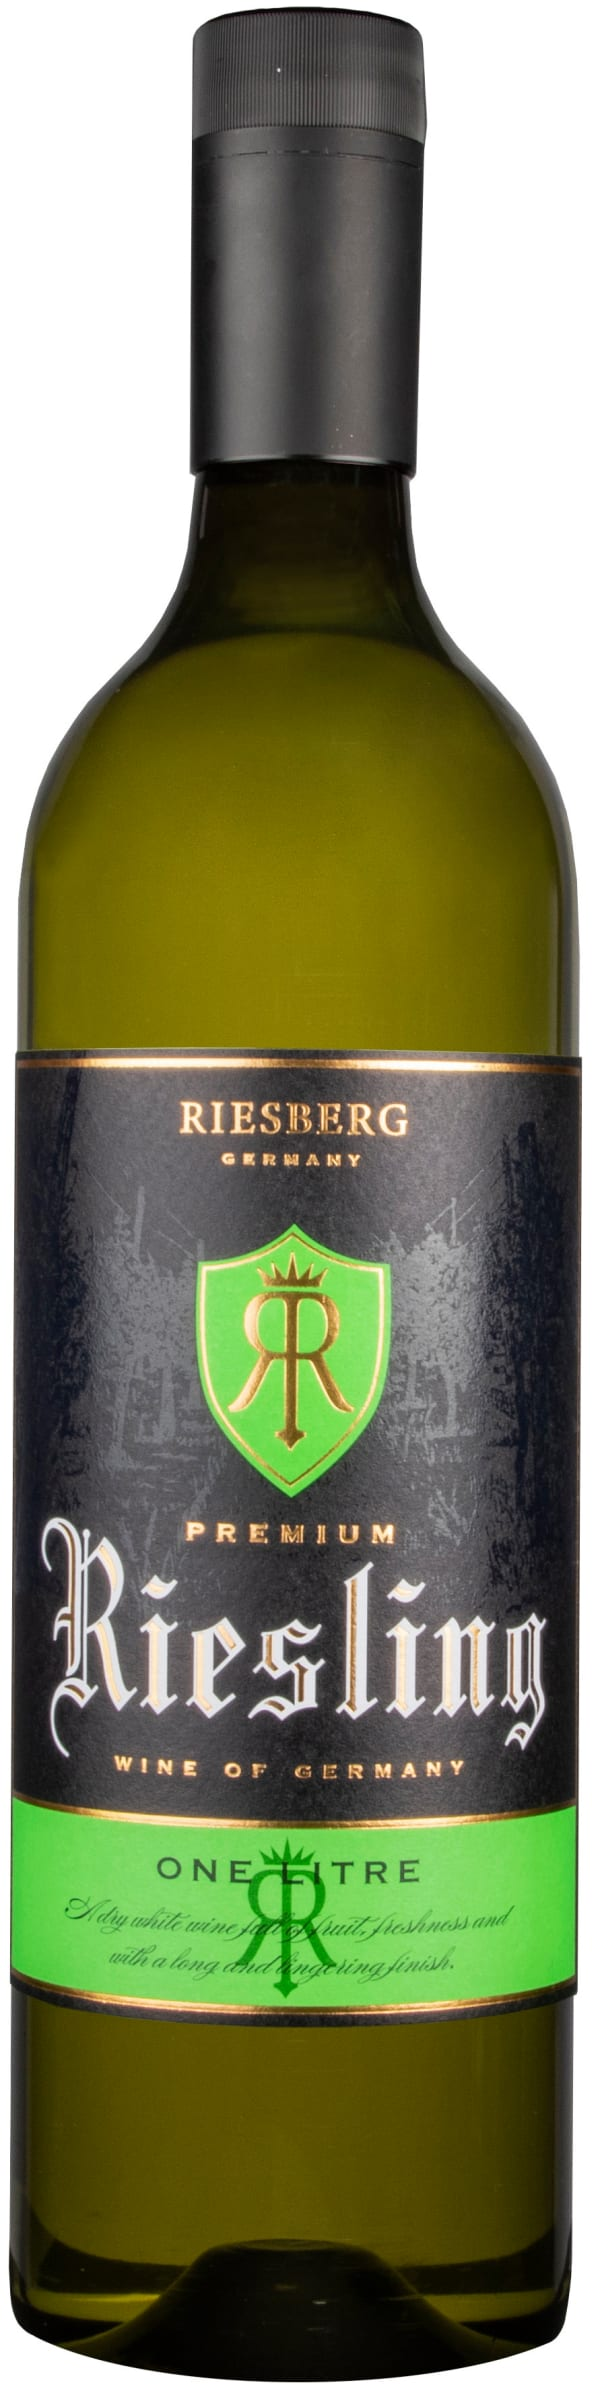 Riesberg Premium Riesling 2018 plastflaska